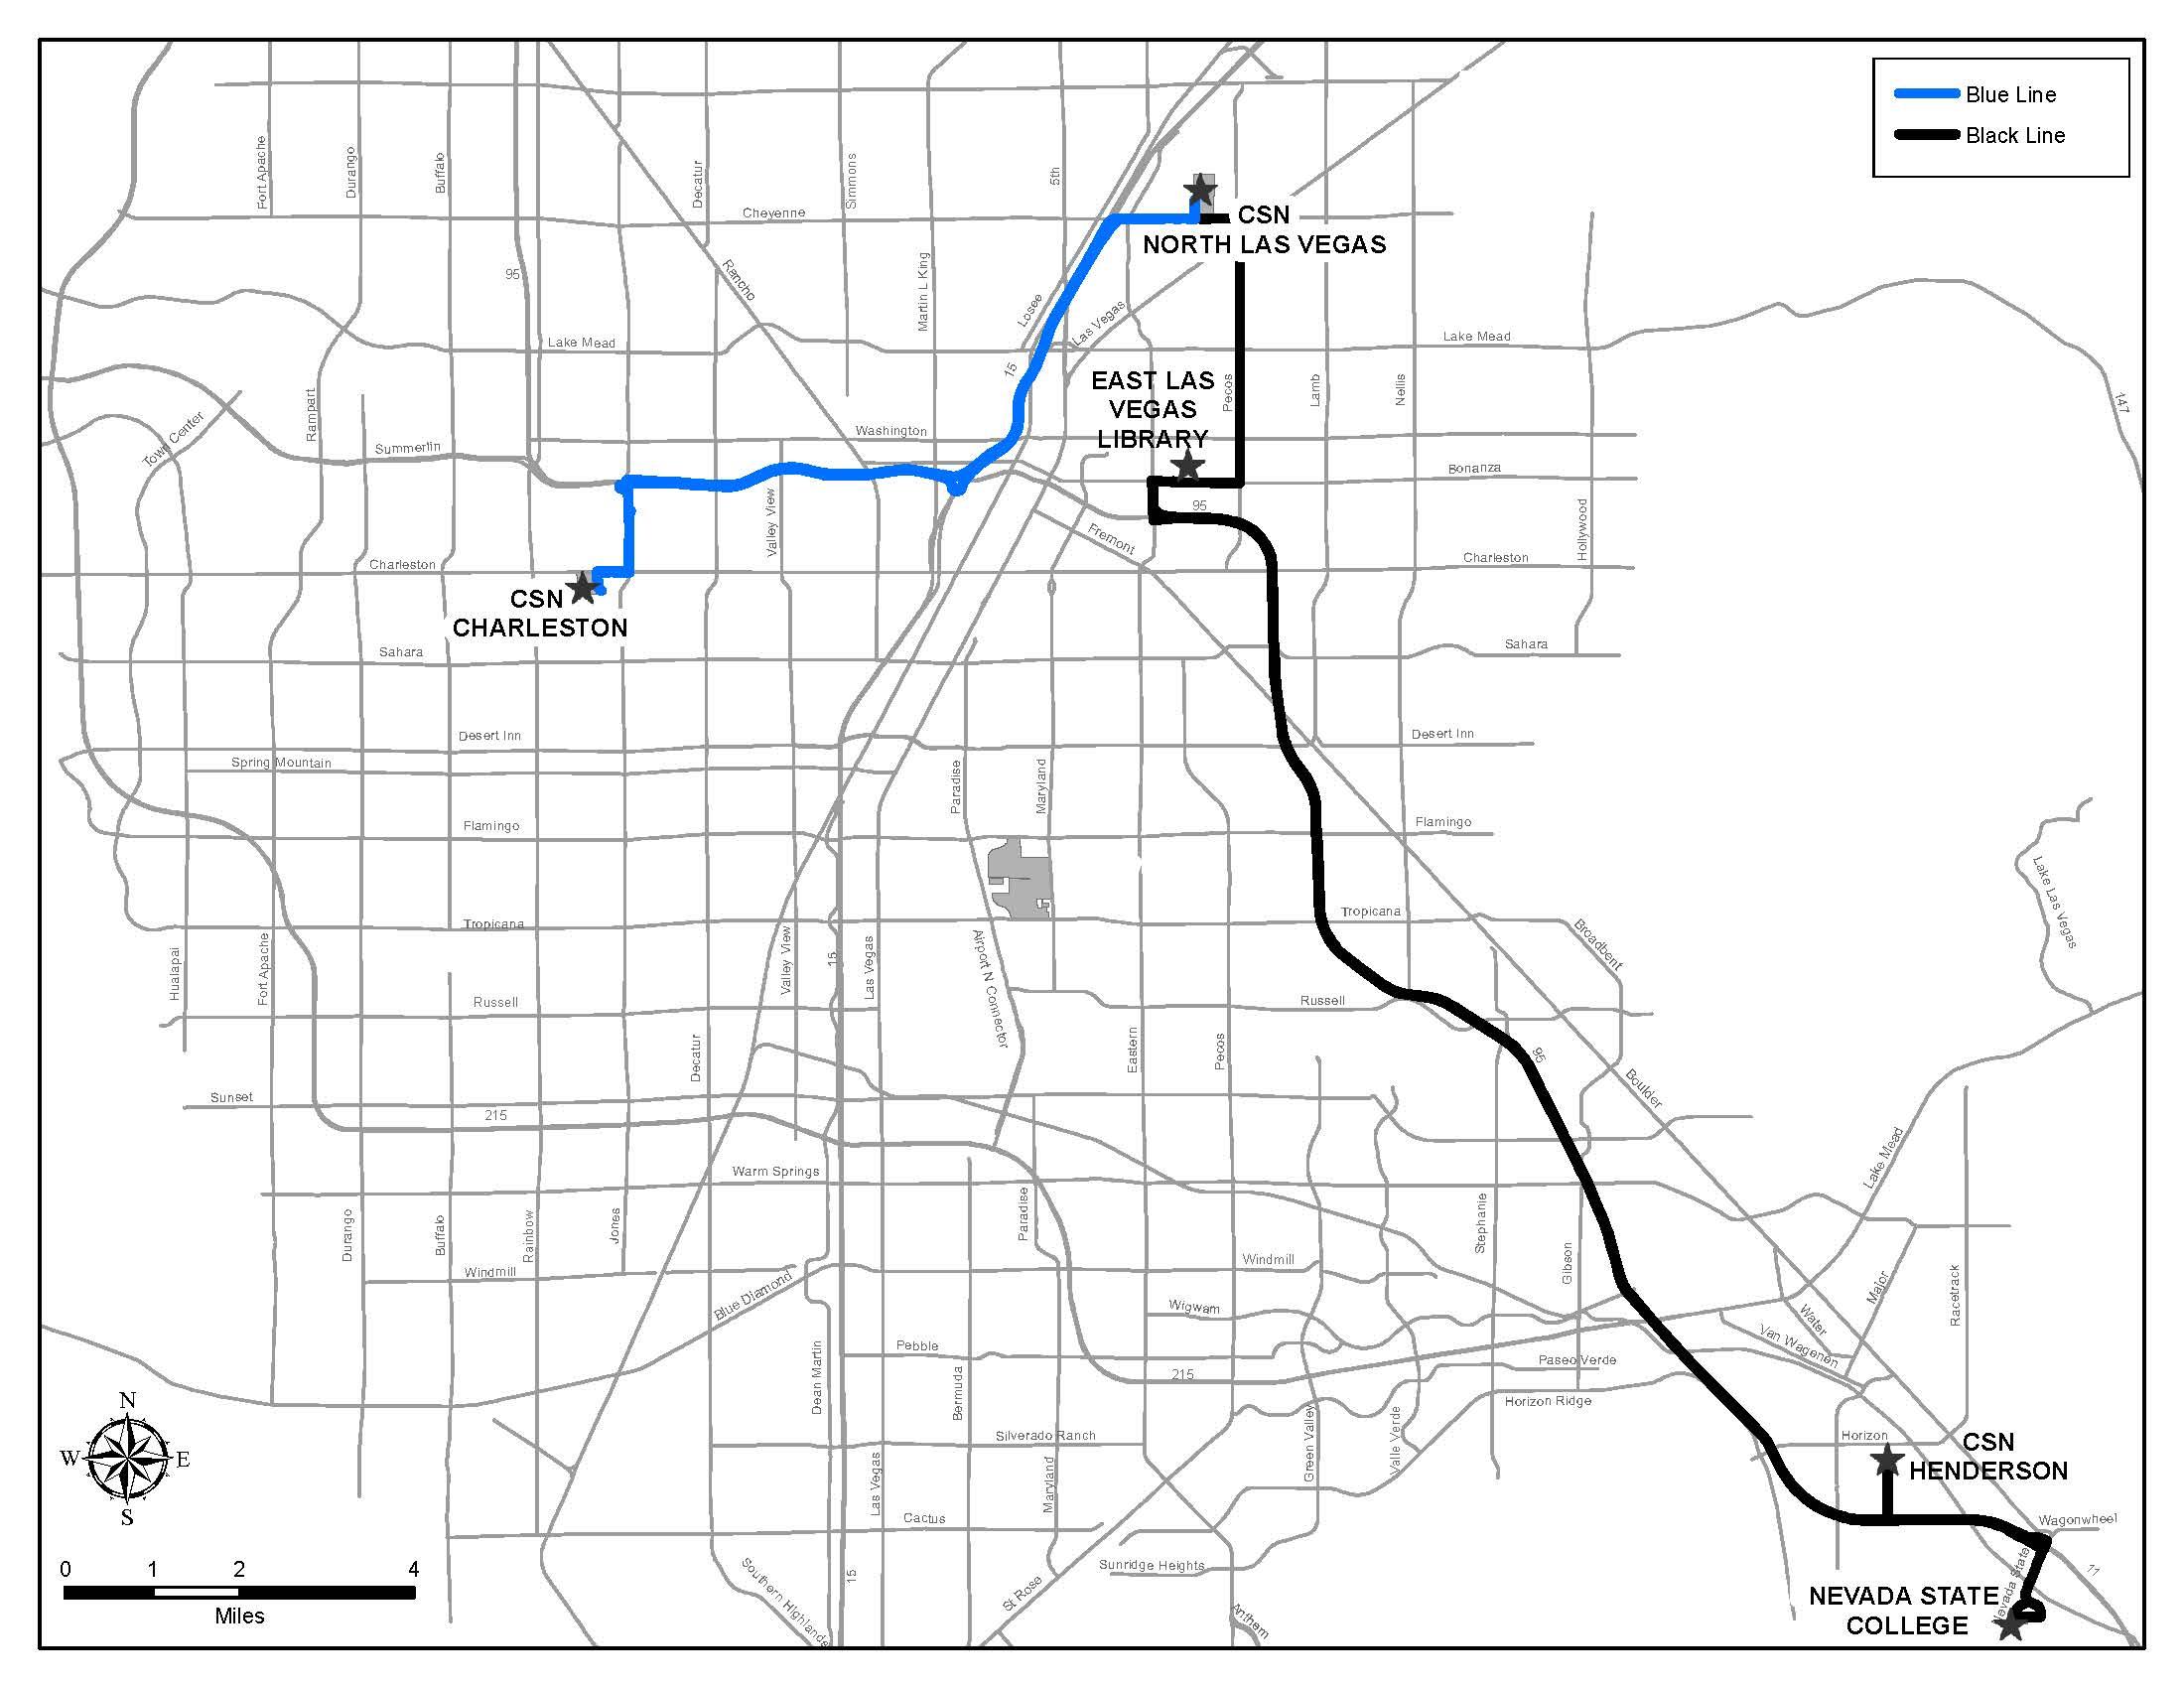 csn henderson campus map Campus Commuter Nevada State College csn henderson campus map